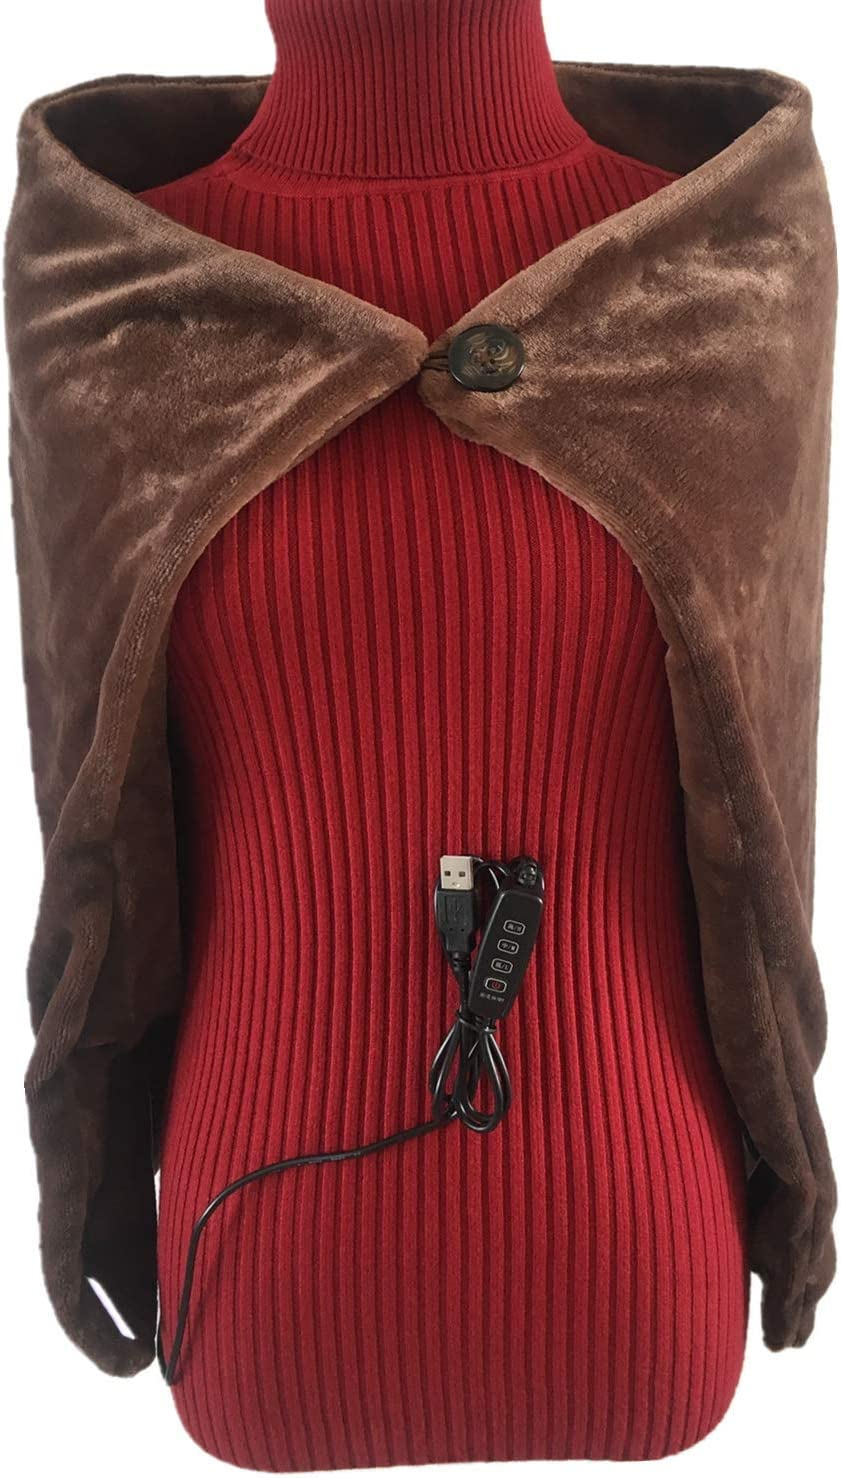 CEBuy USB Heated Shawl, Electric Blanket Throws 5V/2A-3-Heat Setting 34X22 Inch for Car Office Home (Coffee)